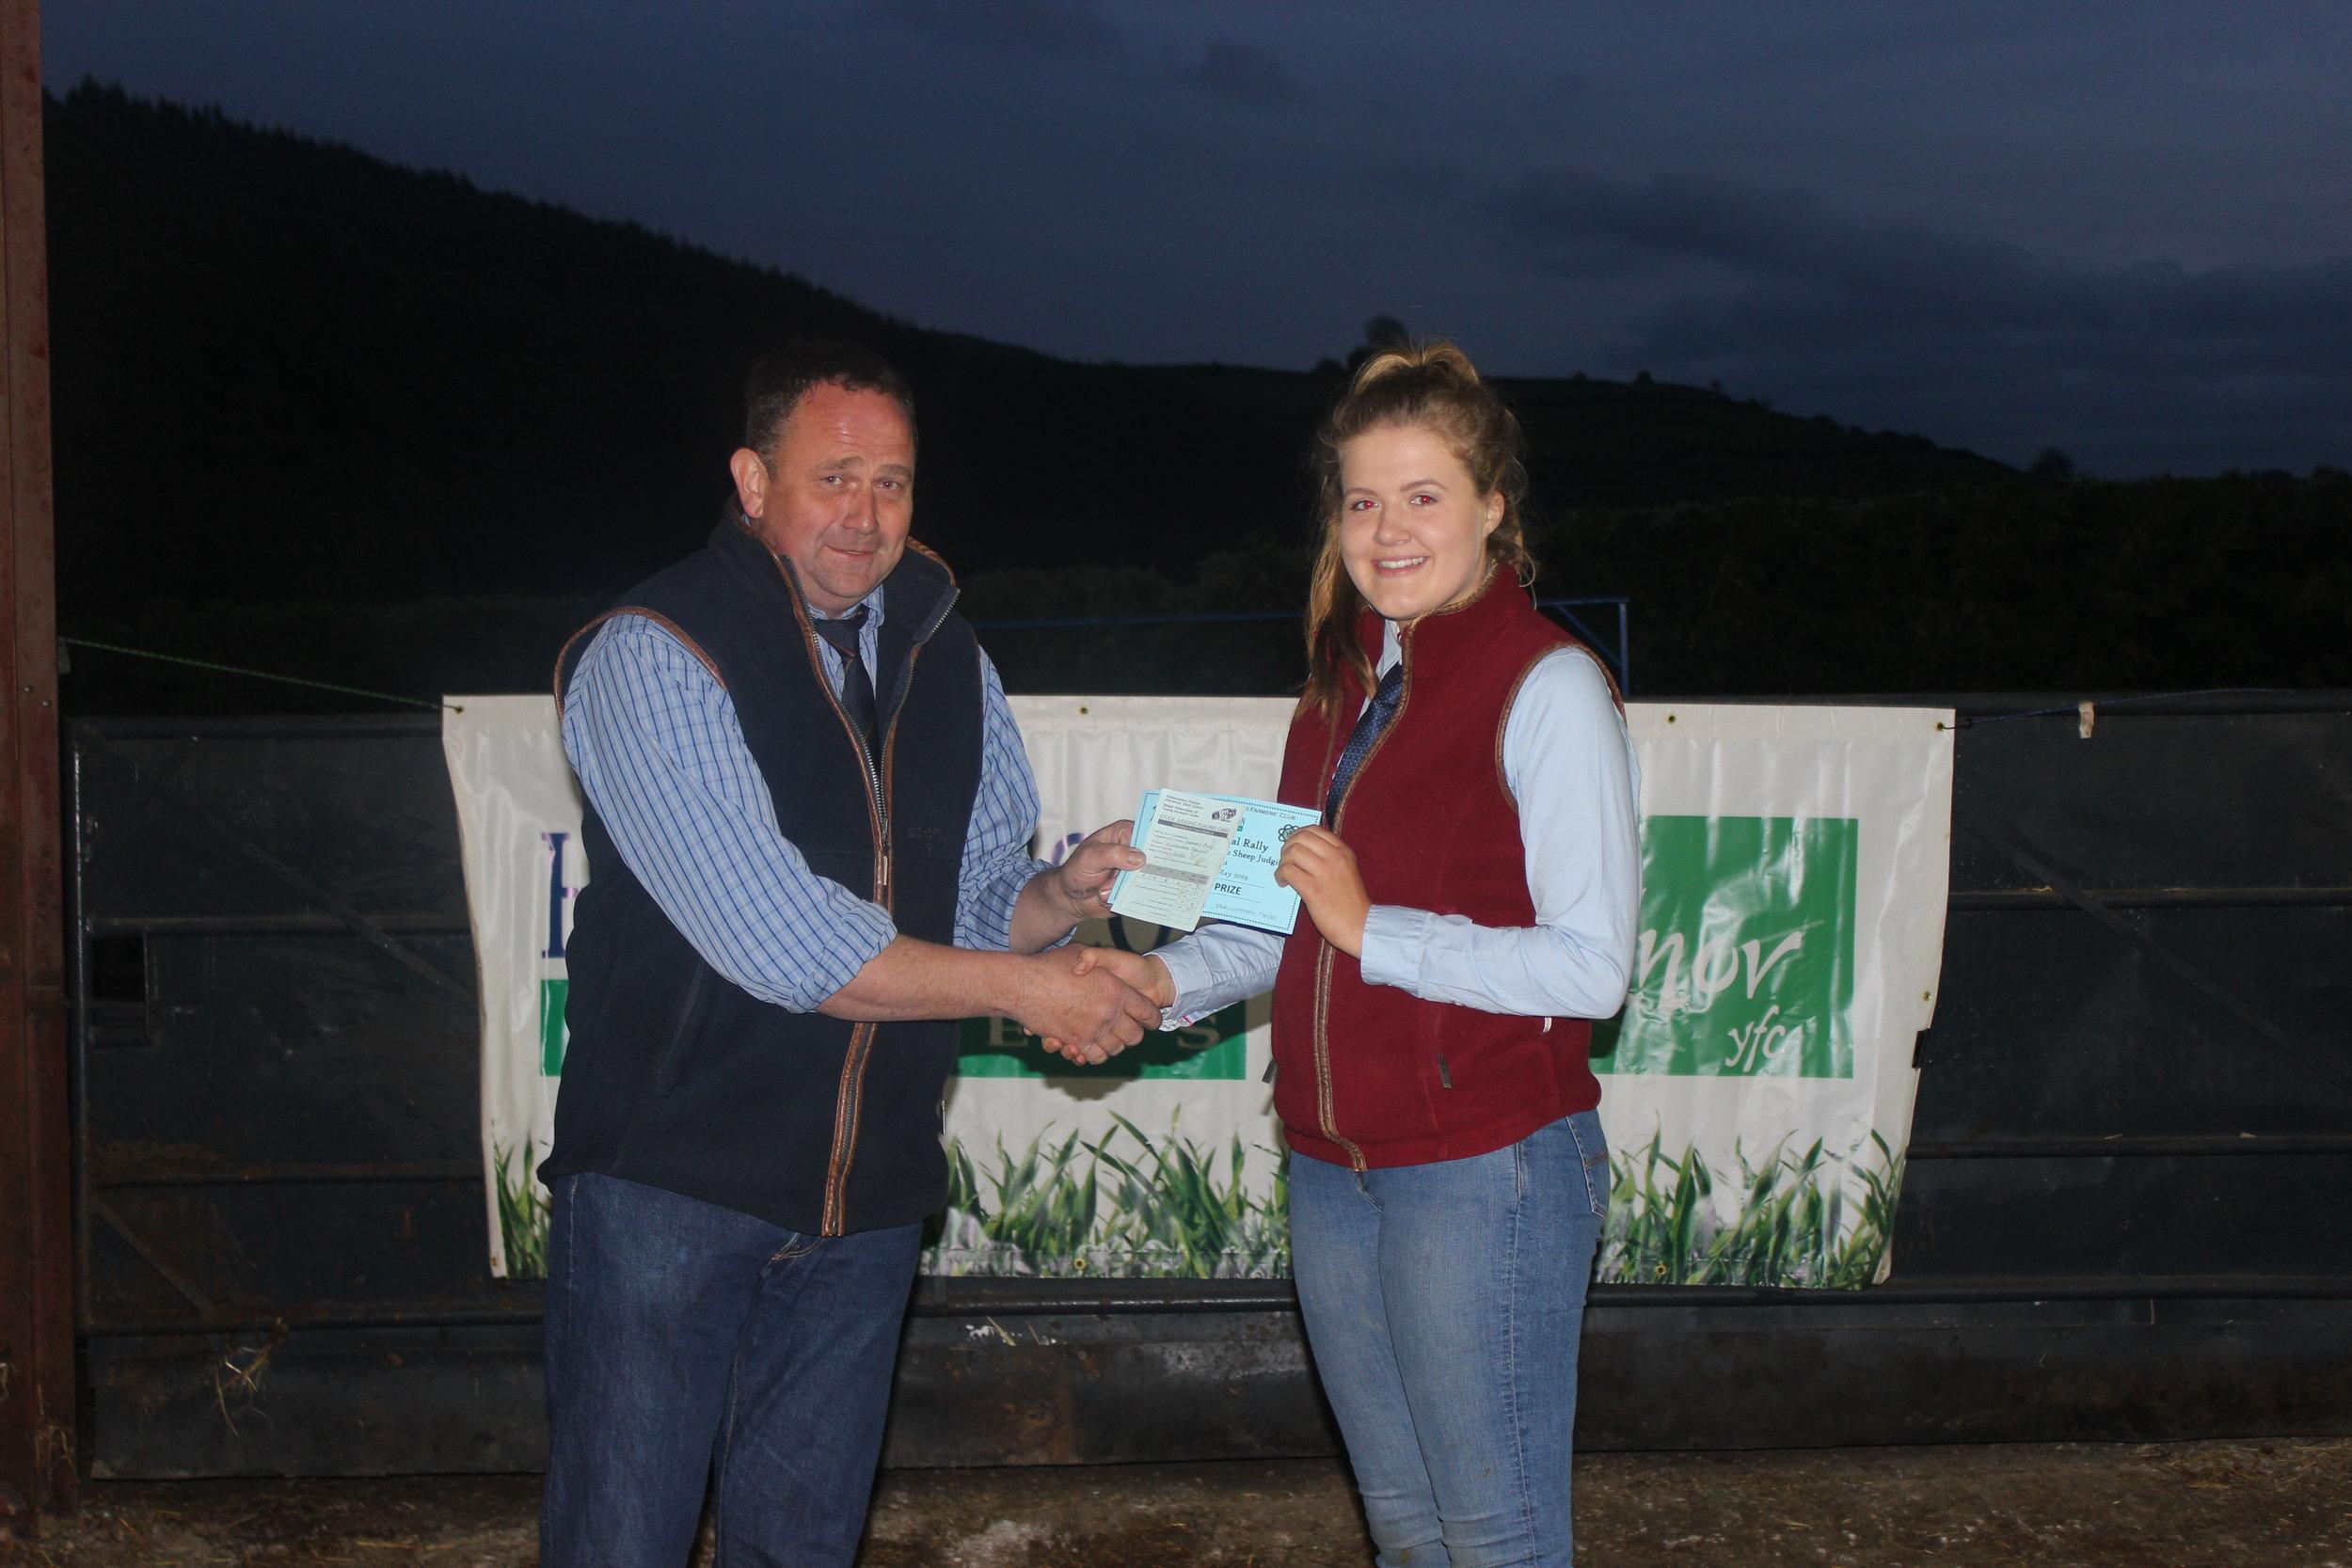 Gemma Price, Llanbadarn Fynydd YFC - 2nd place in the Welsh Mule Stockjudging with Judge Geoff Probert.